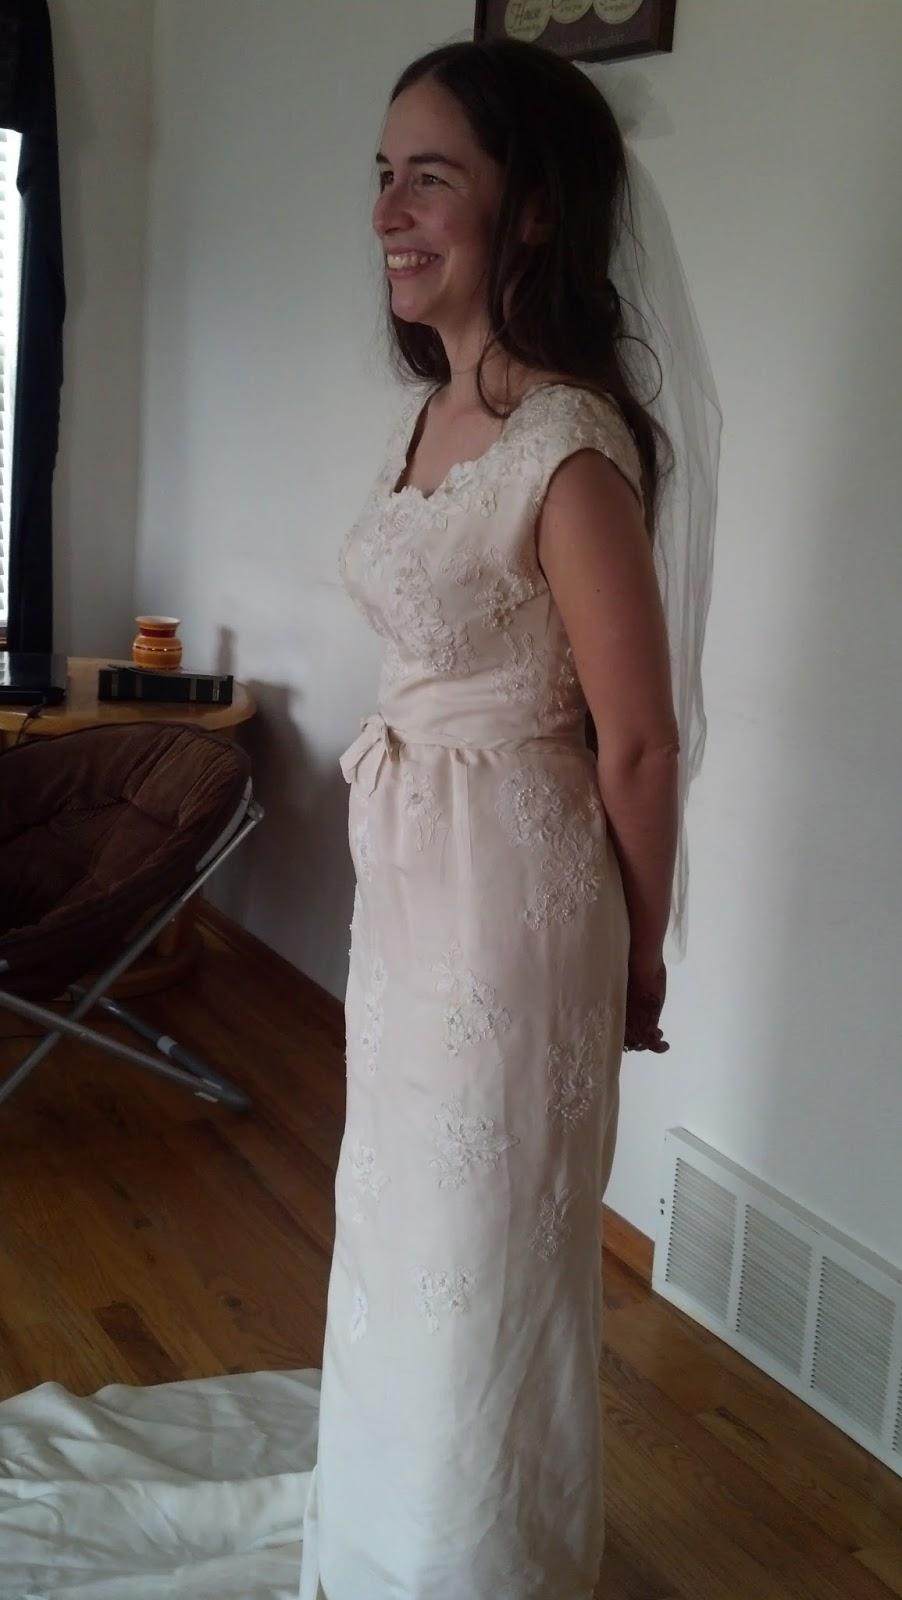 Tye Dye Wedding Dresses 92 Fresh The necklace she is